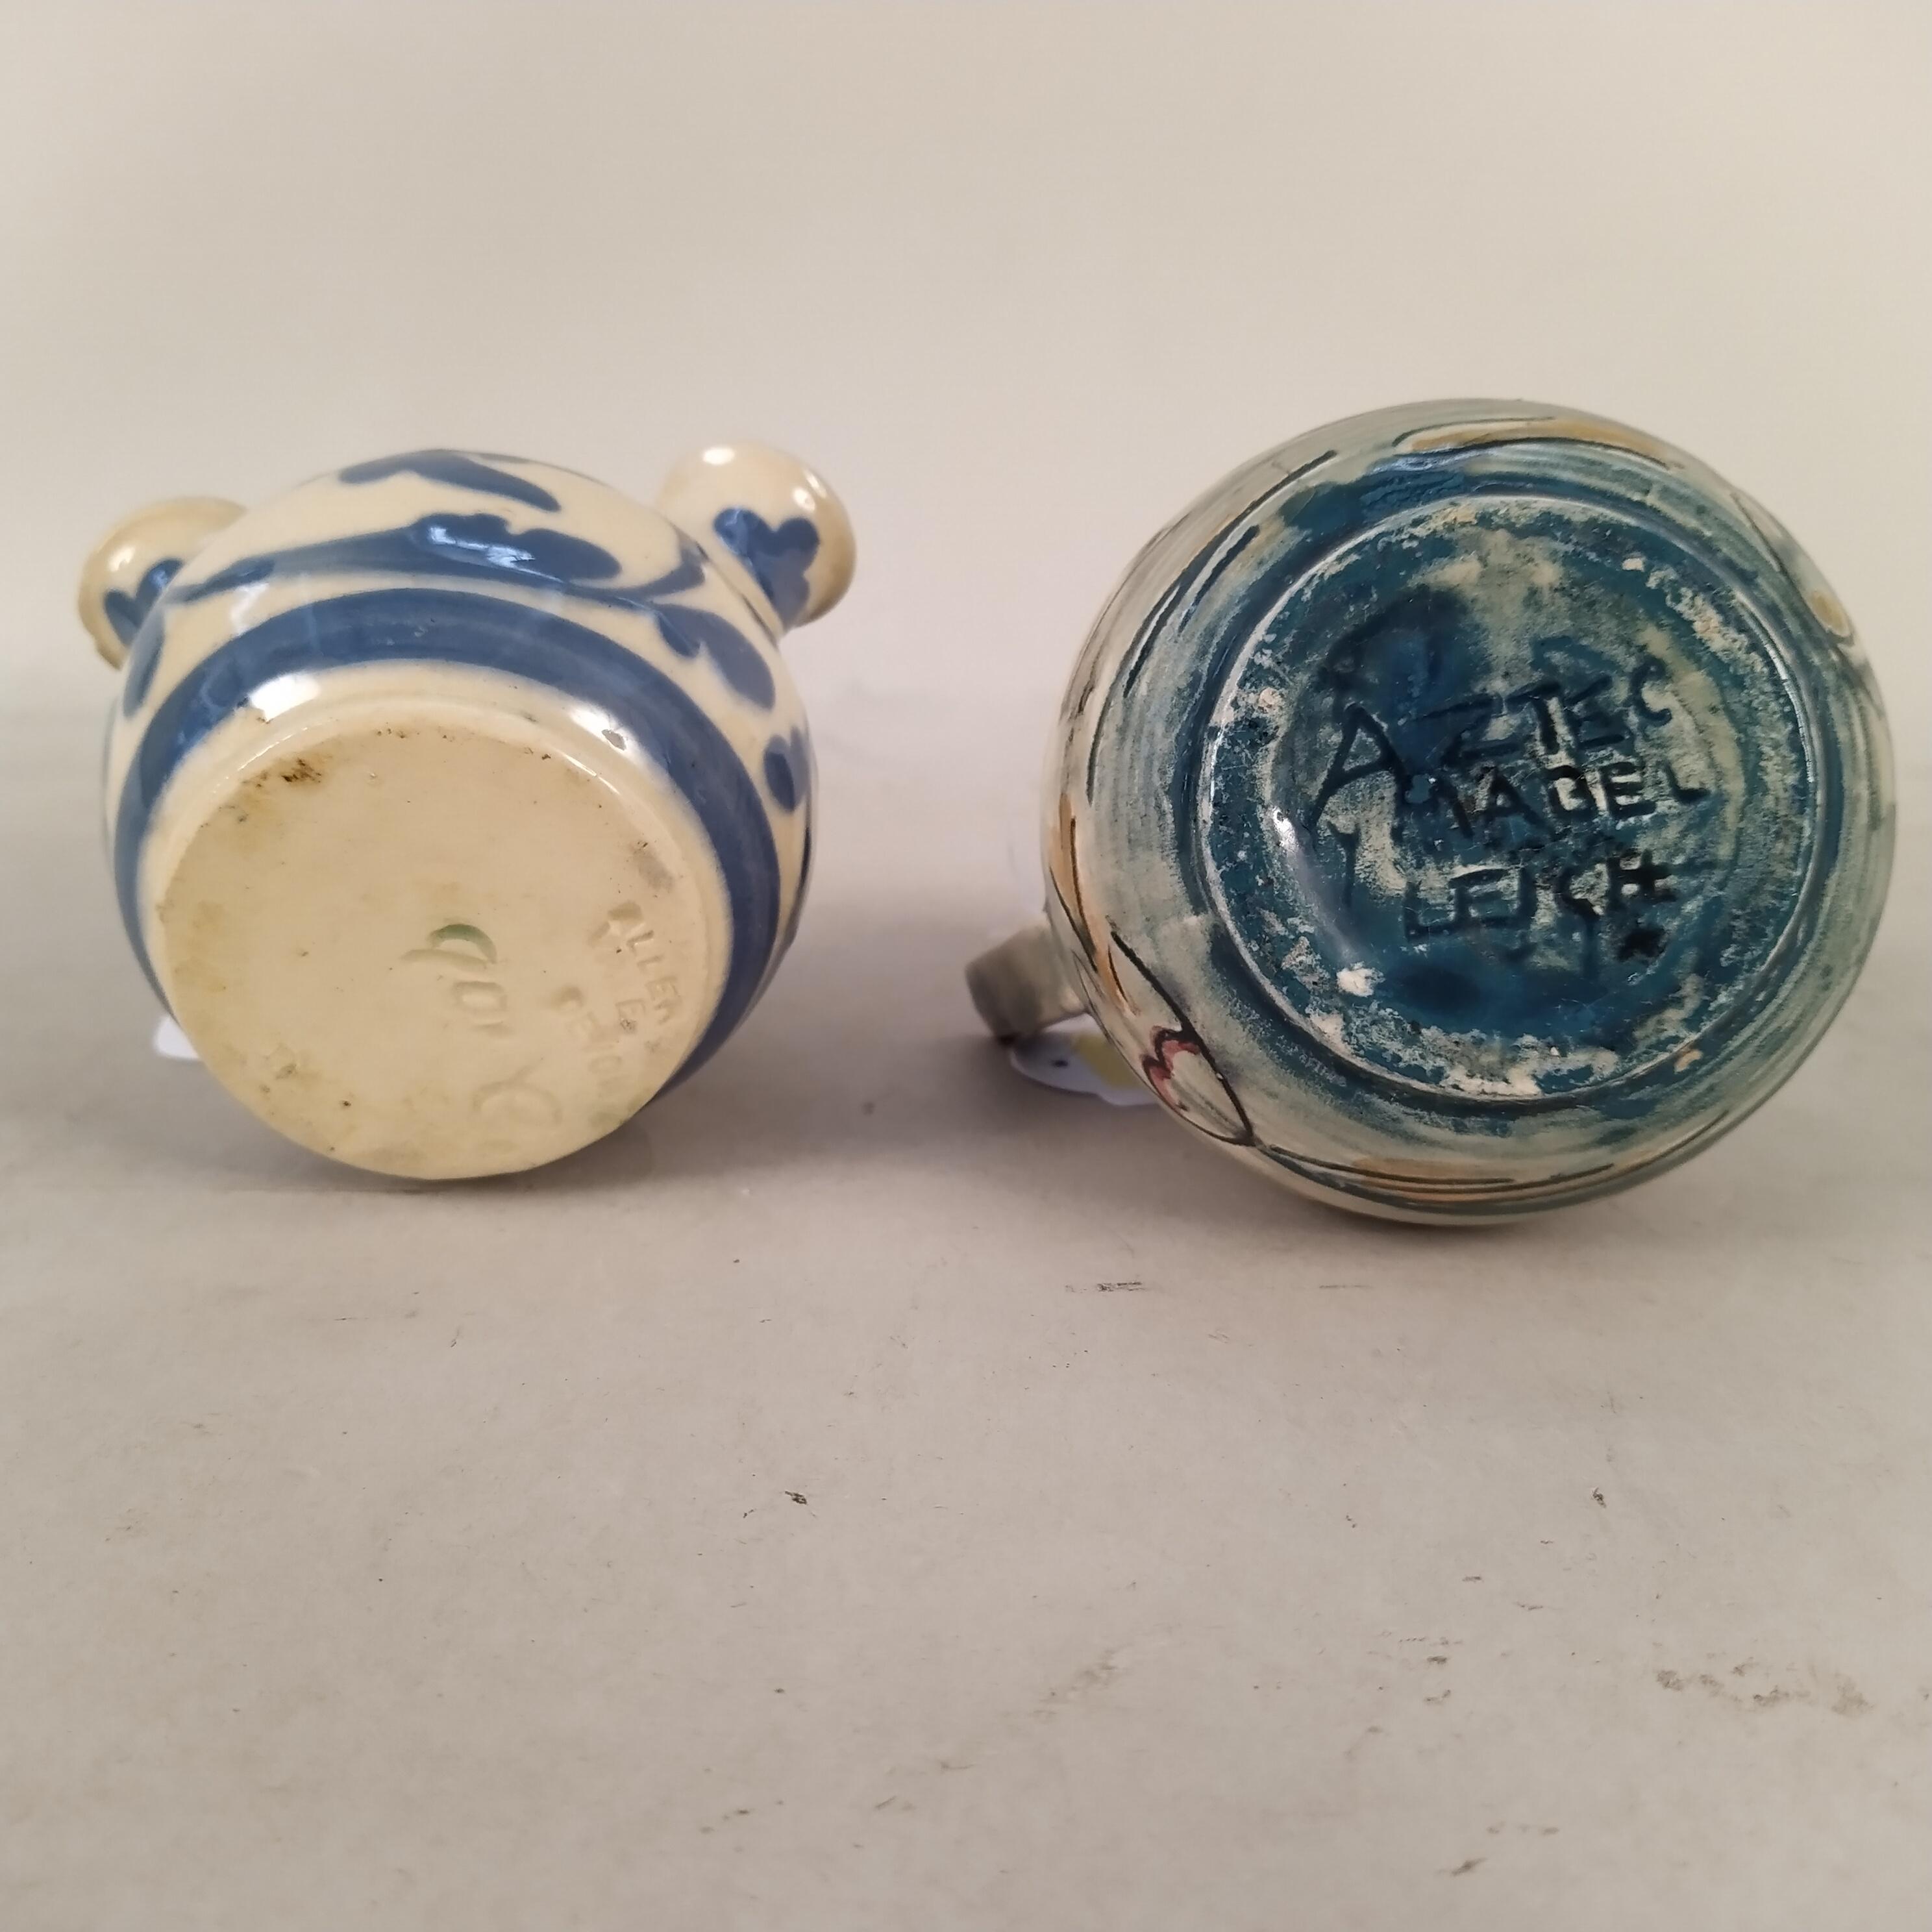 A Mabel Leigh Aztec pattern jug plus an Aller Vale bulb vase - Image 3 of 3